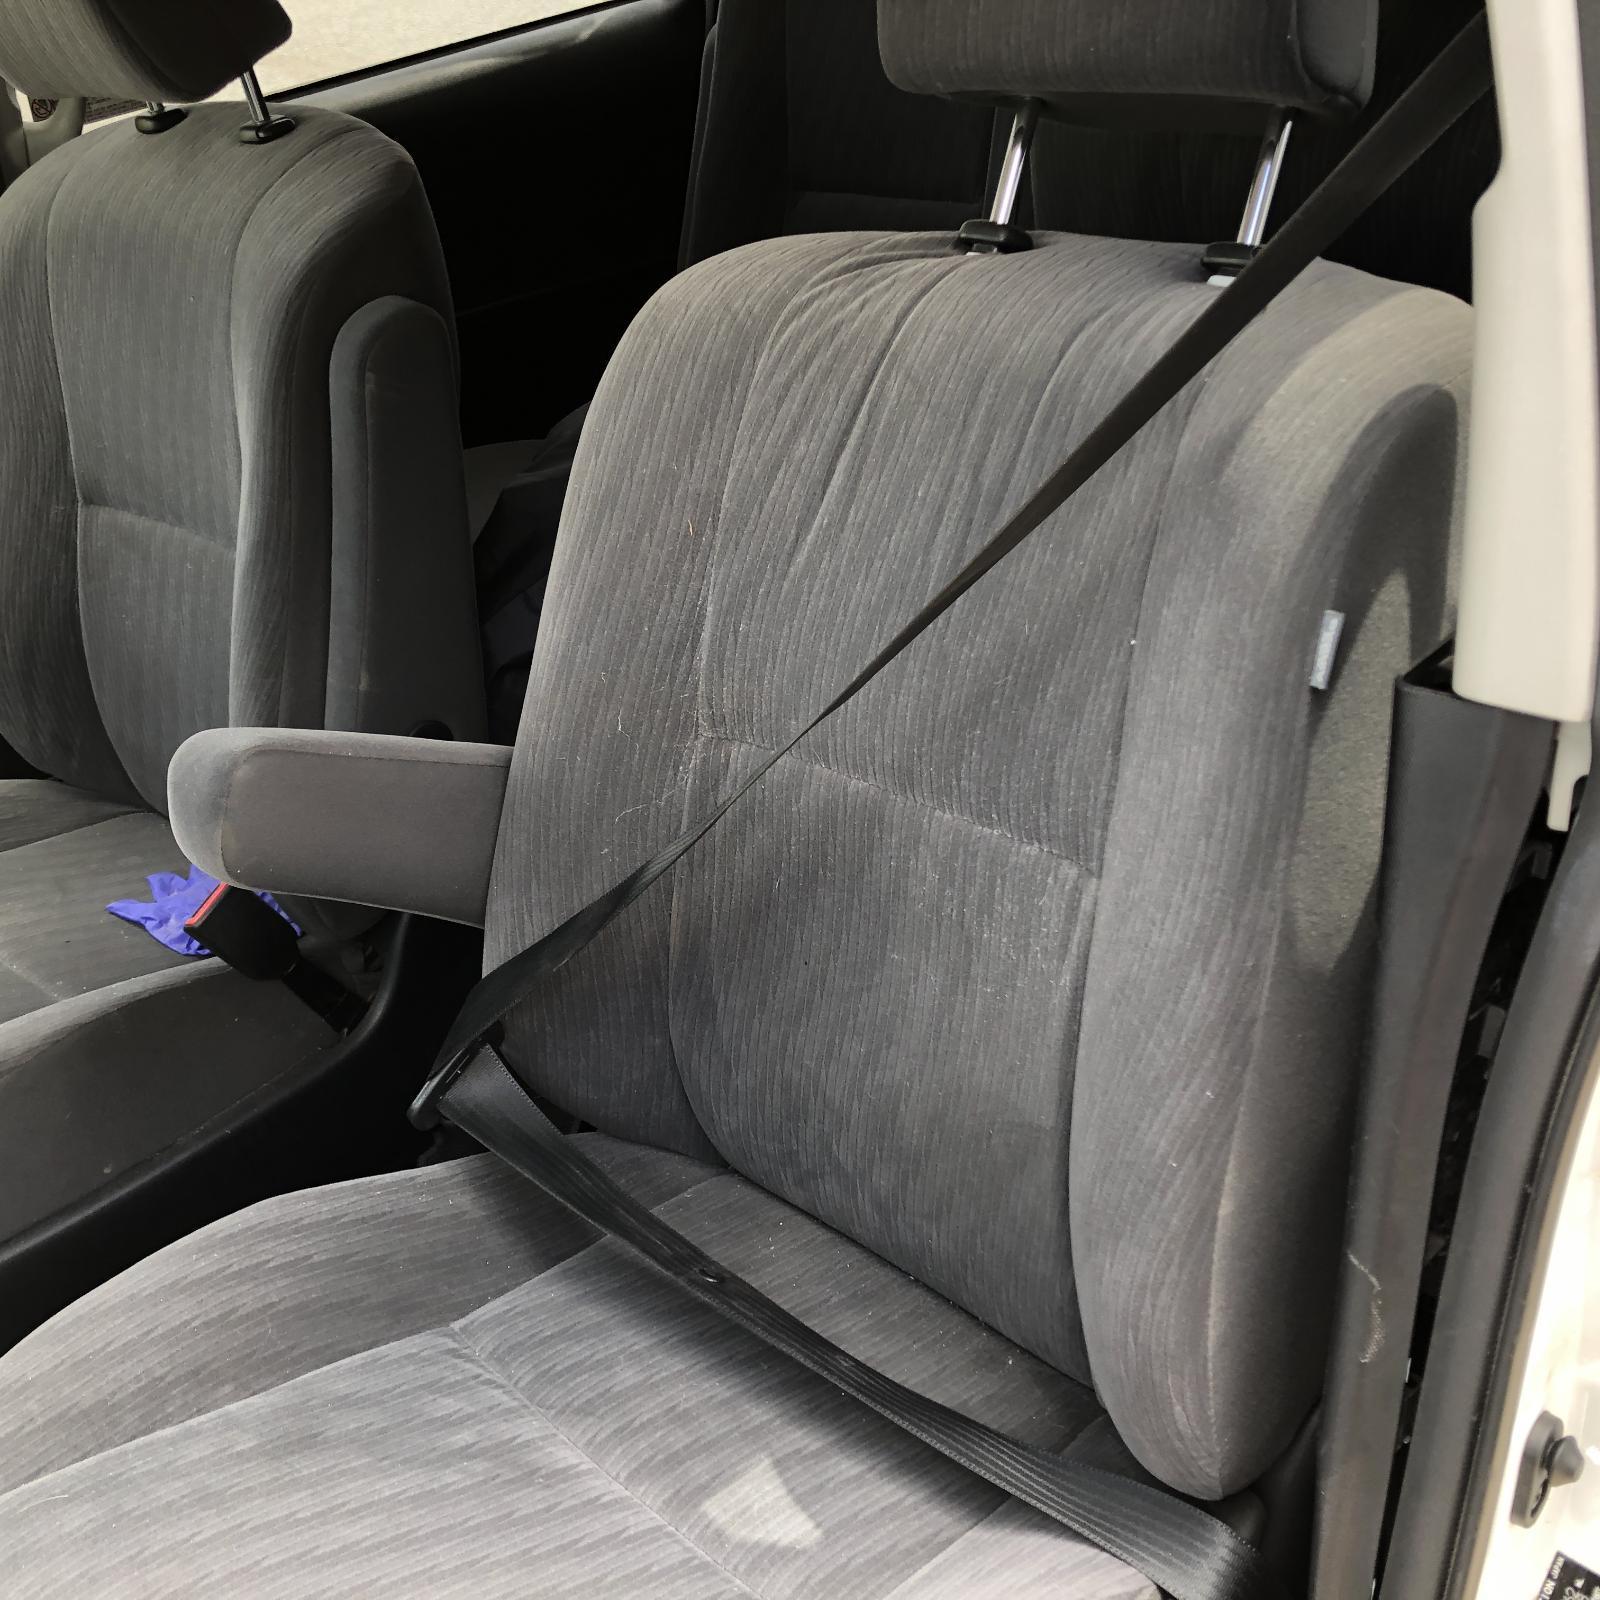 TOYOTA TARAGO, Front Seat, LH FRONT, CLOTH, DARK GREY, ACR50R, AIRBAG TYPE, 03/06-